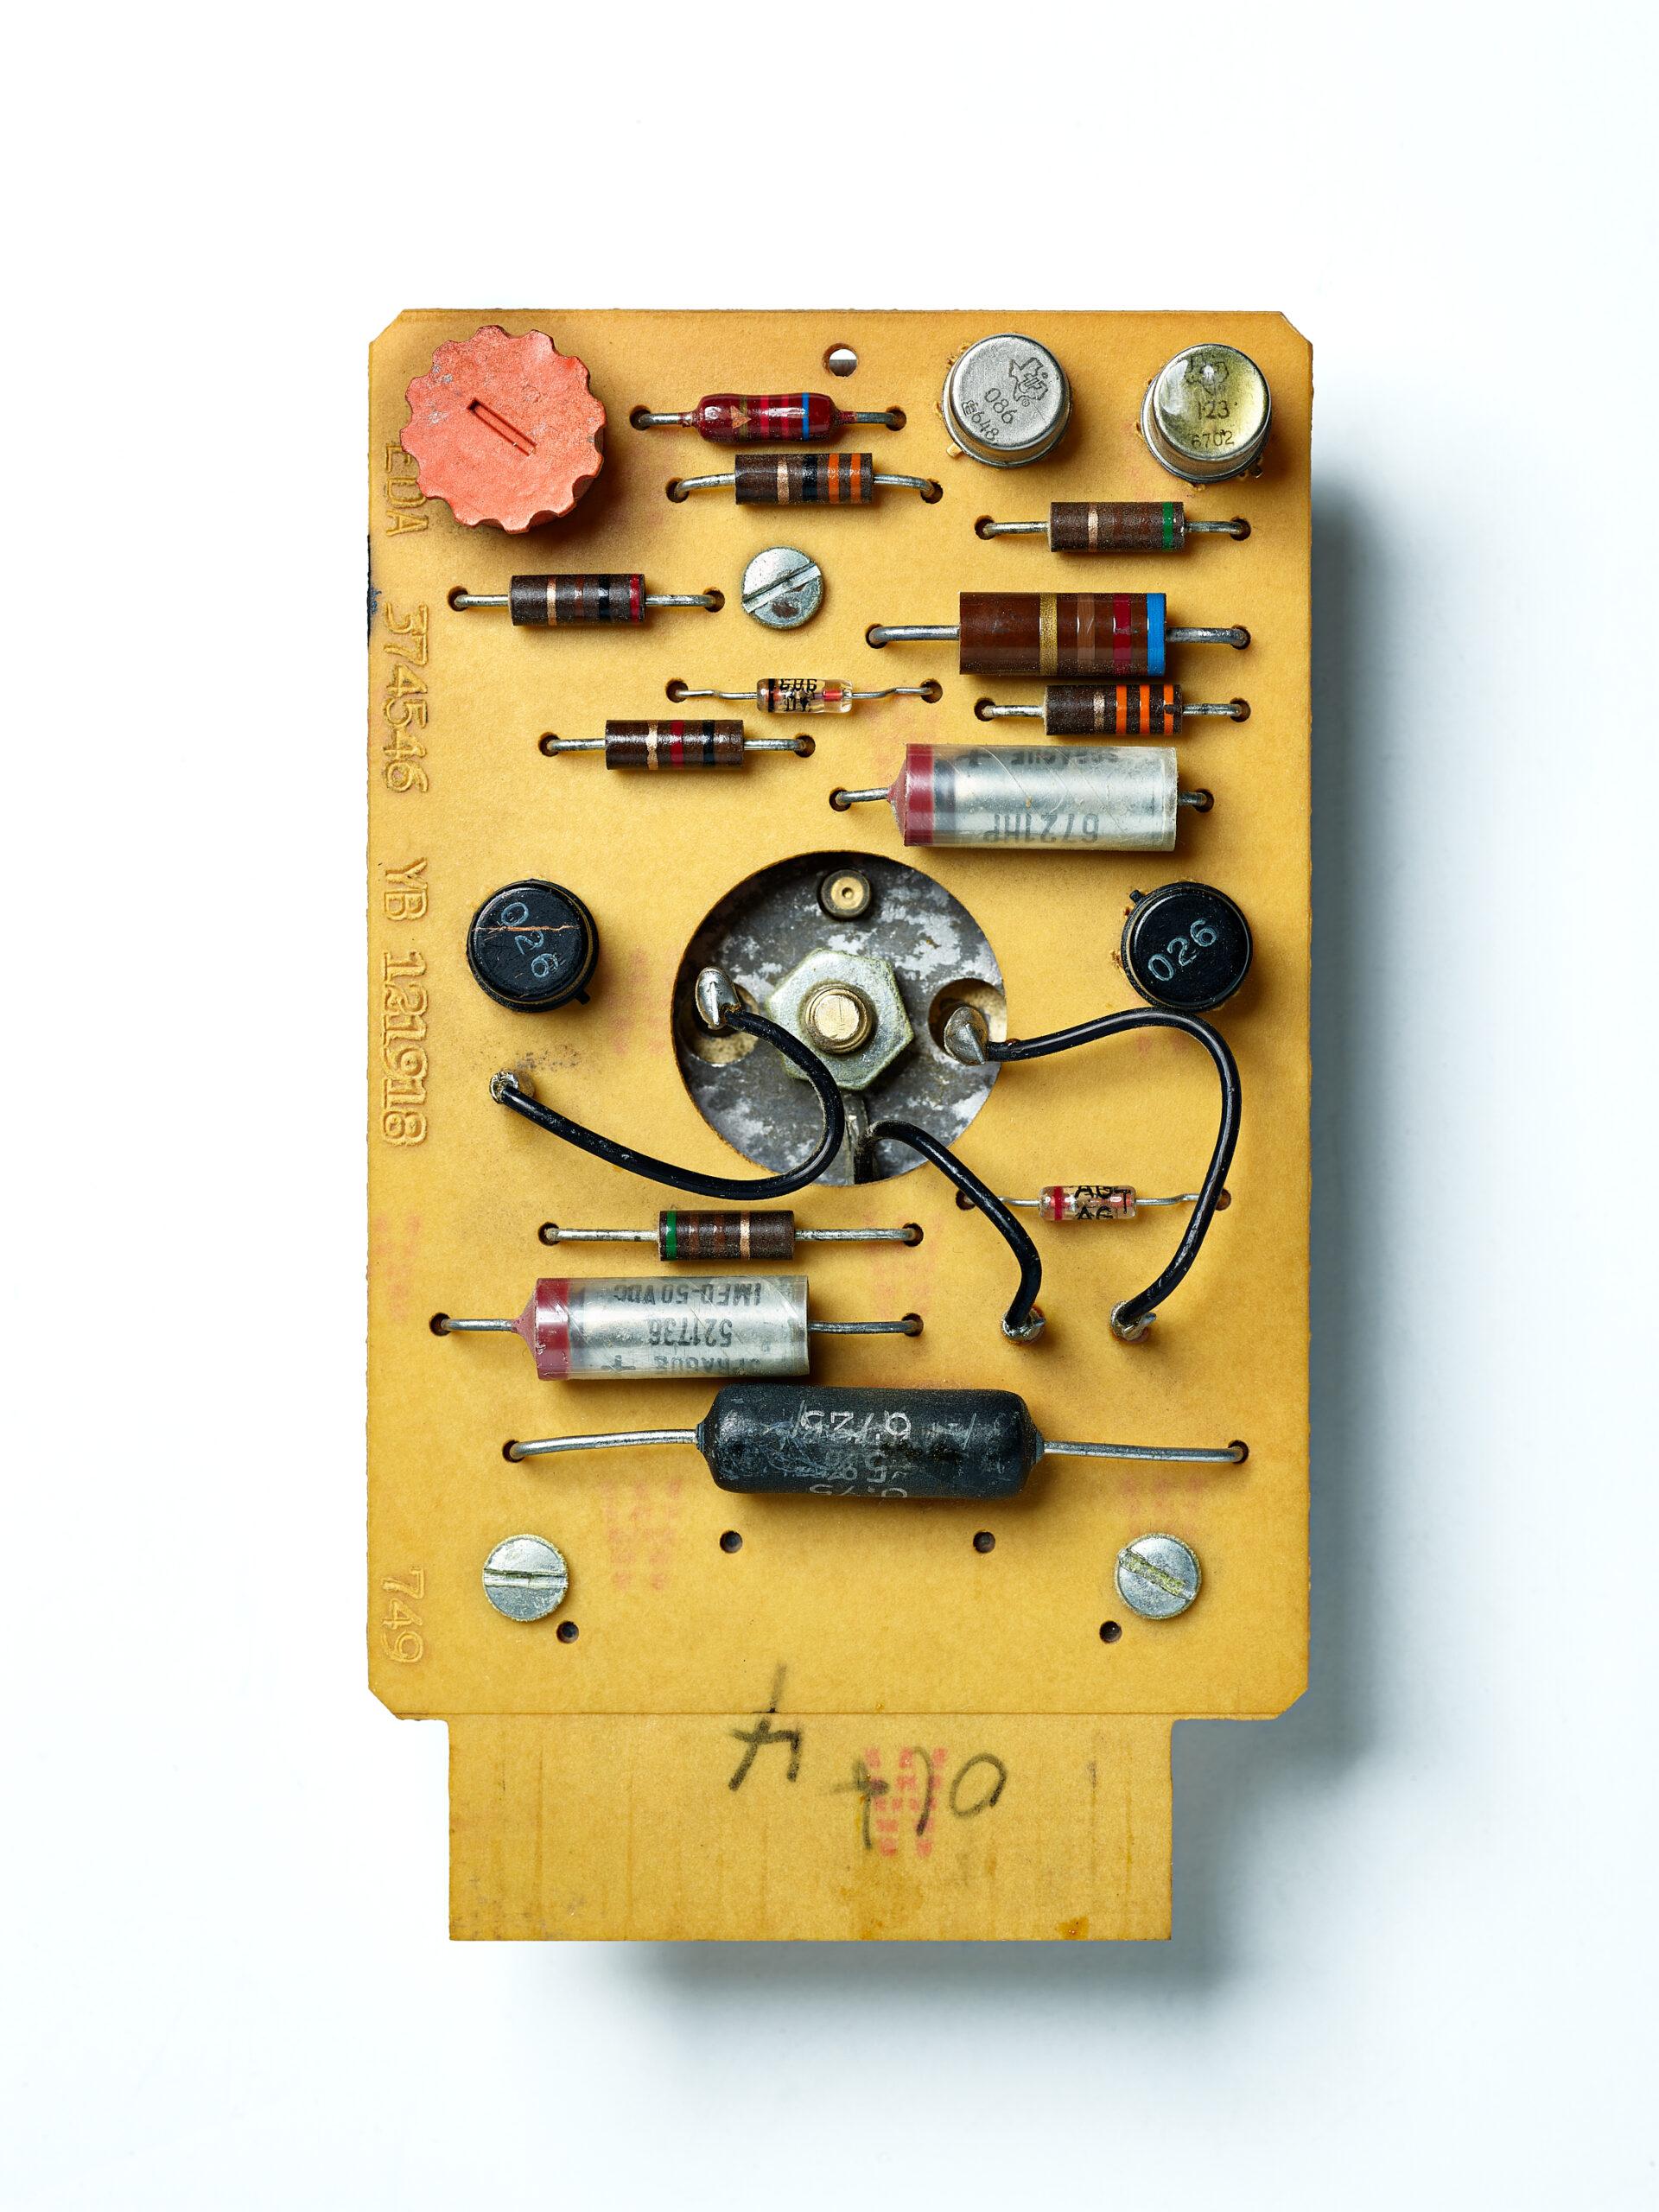 IBM SMS Card EDA. SMS Card, vintage computing, tech history, computer, mainframe, transistors, circuit board.